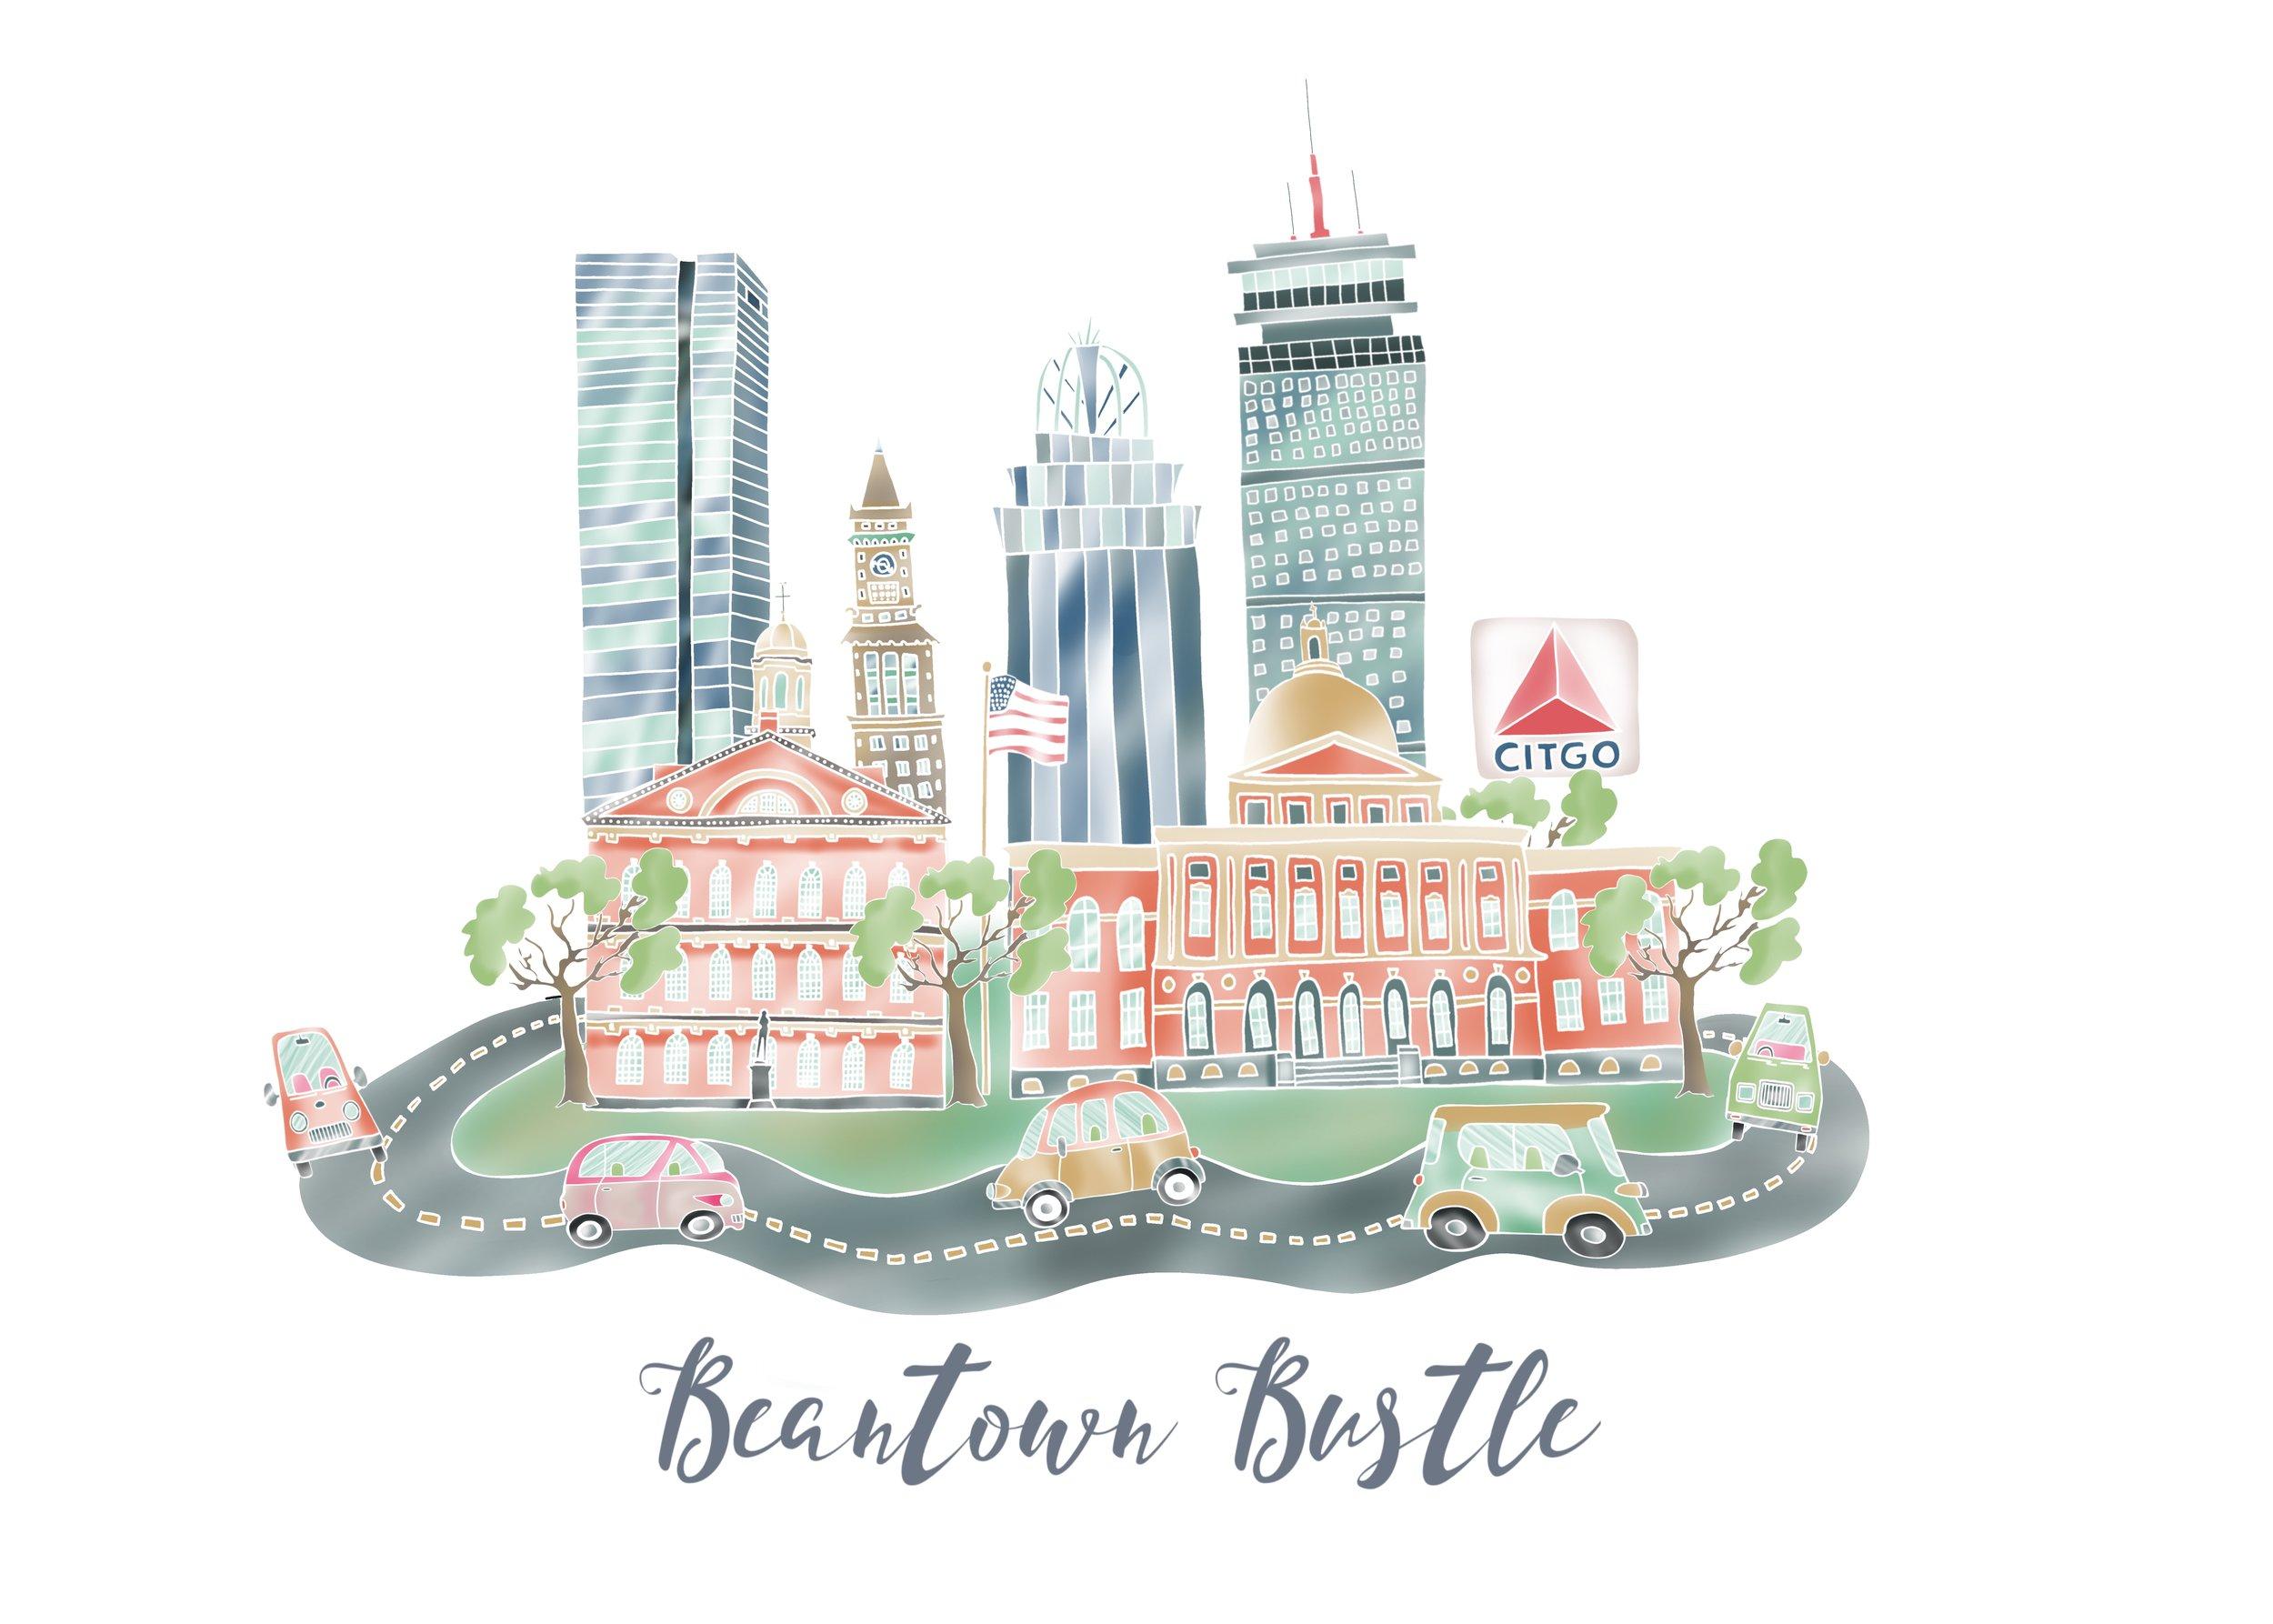 Beantown Bustle